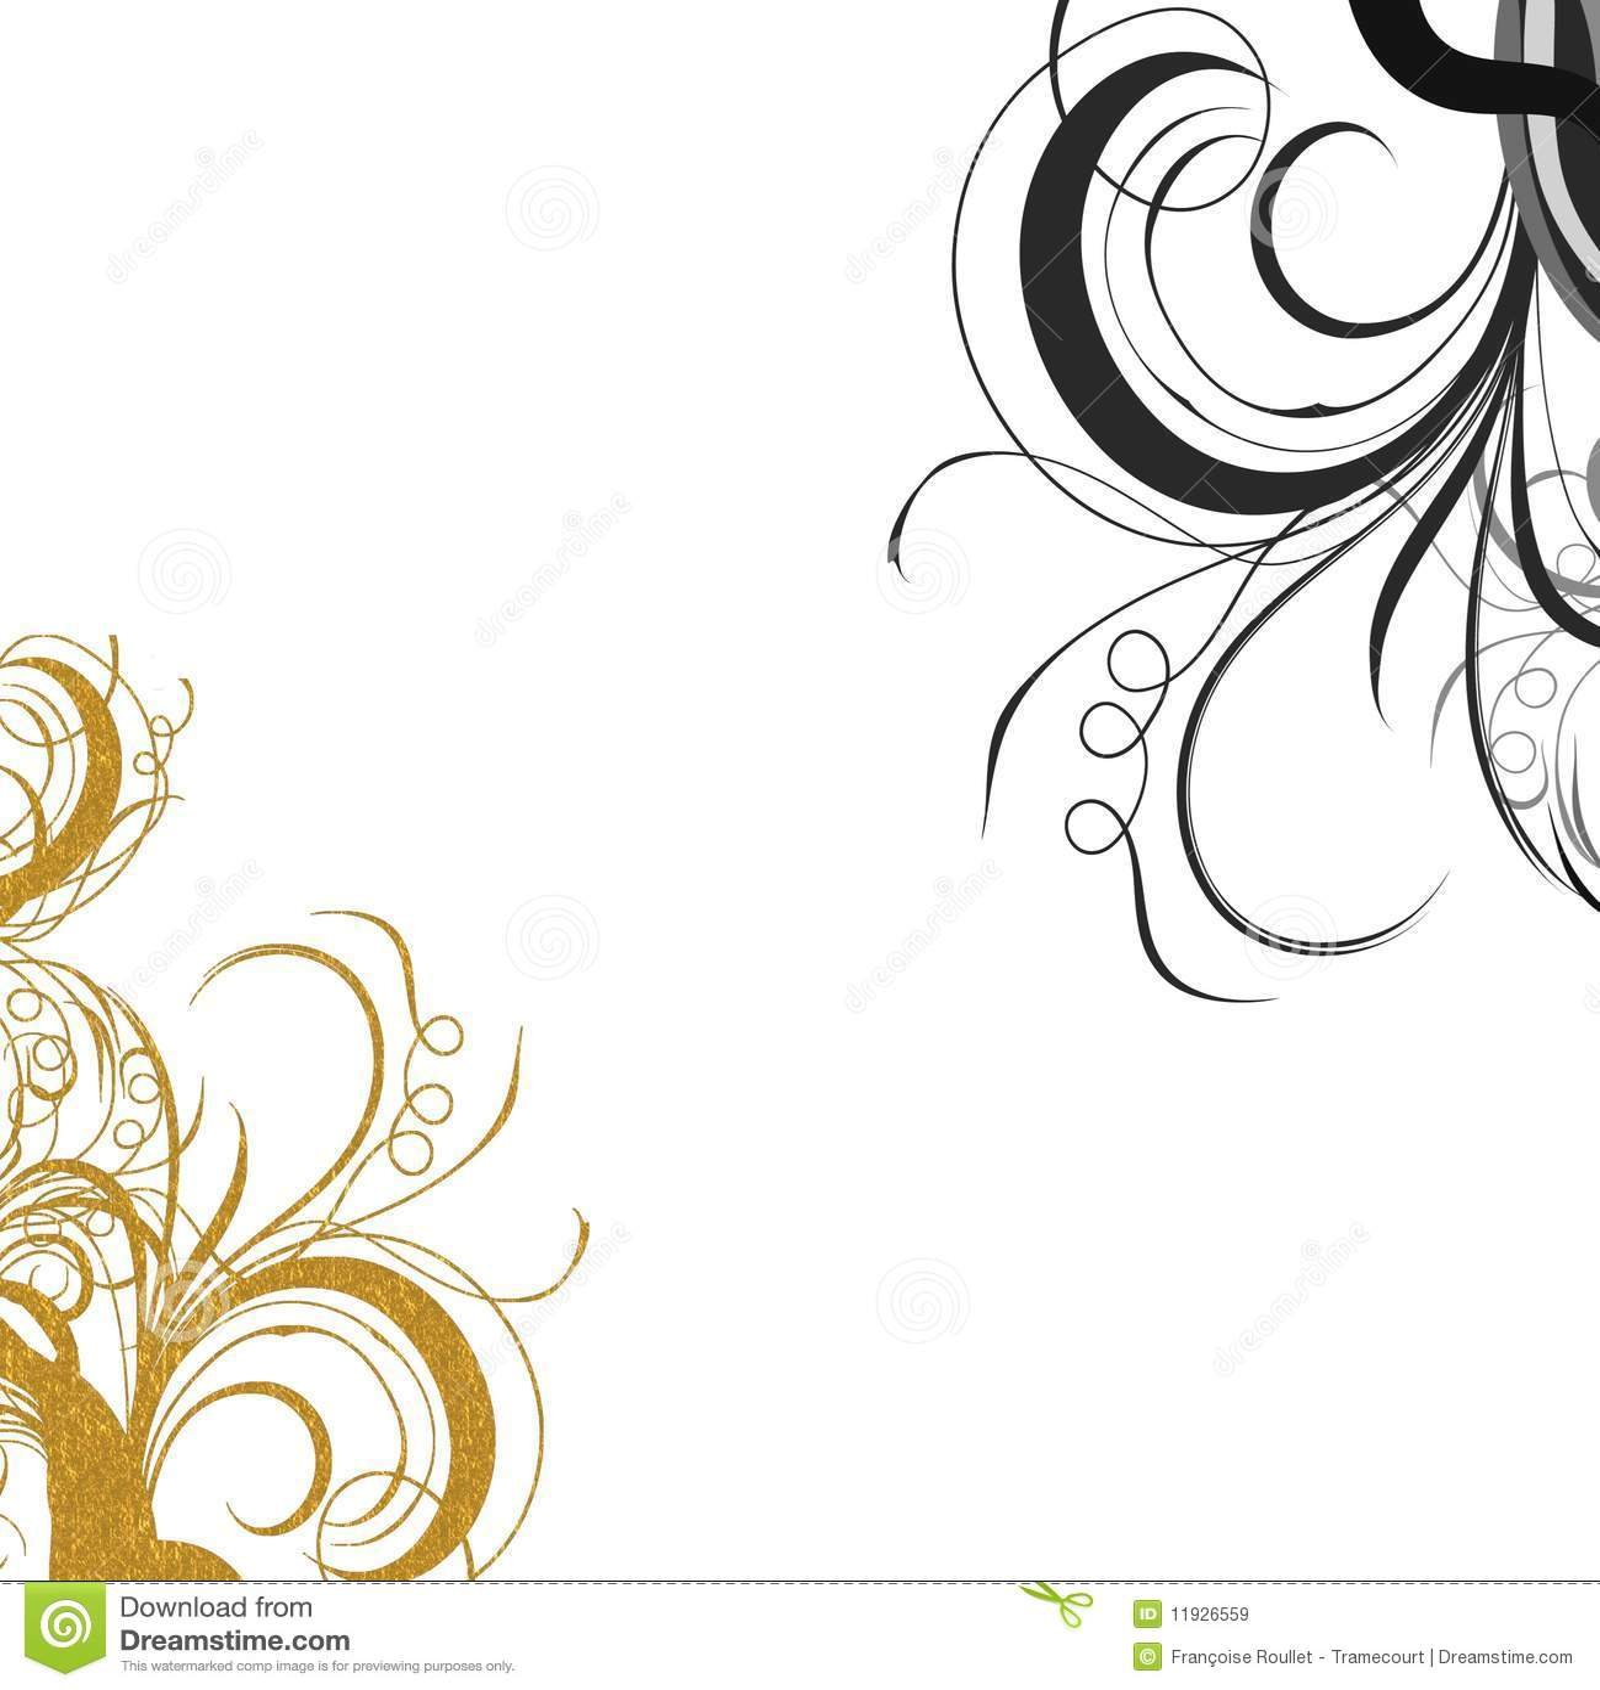 gold black swirls royalty free stock images